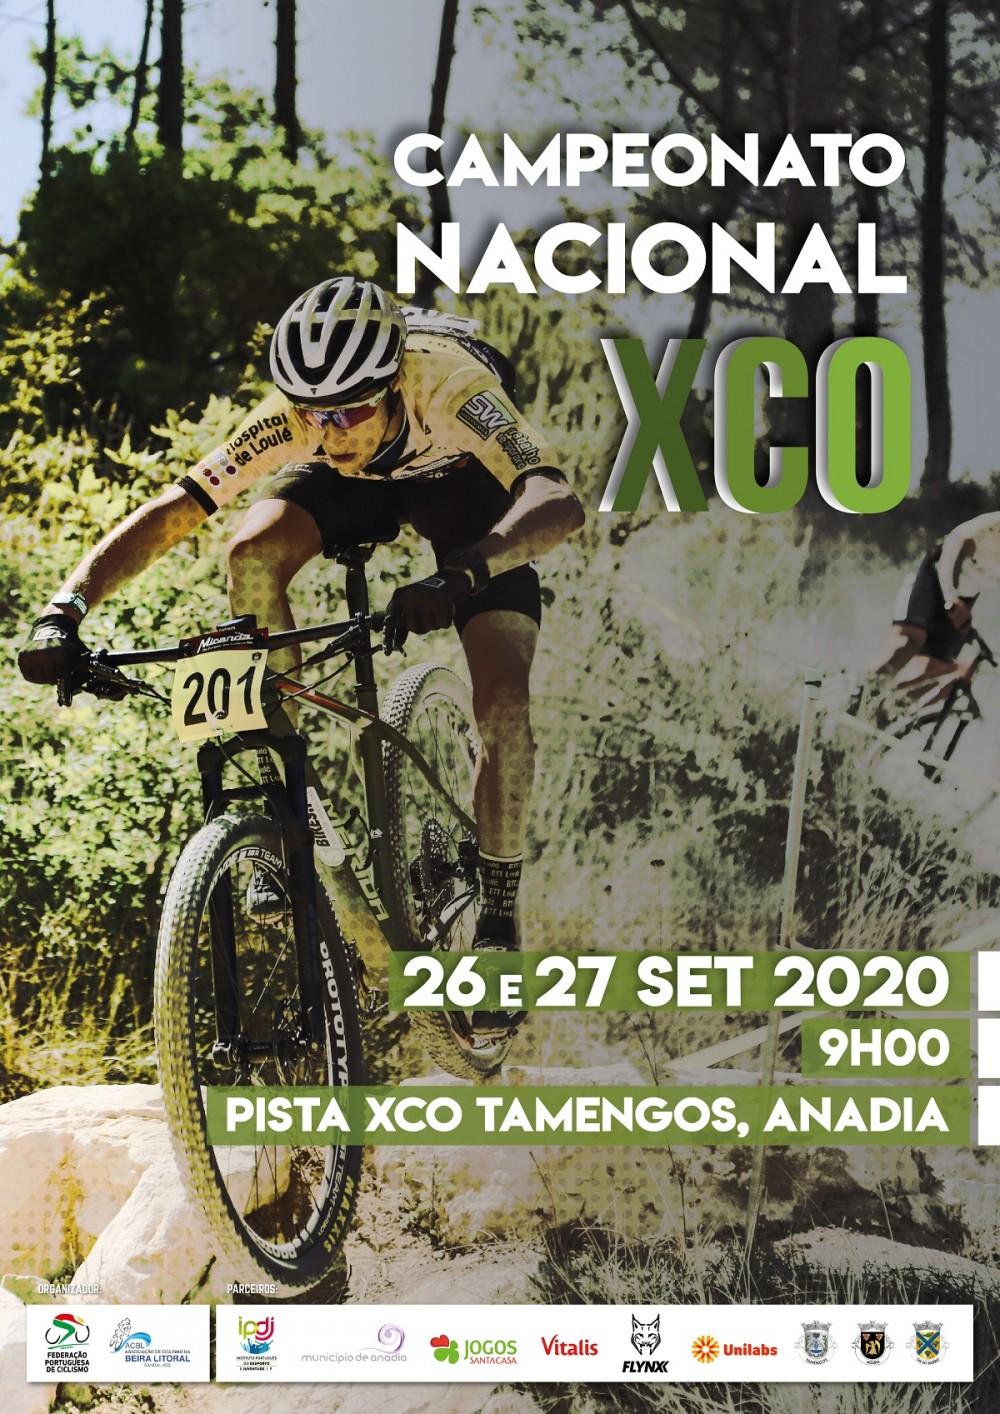 Campeonato Nacional XCO - Tamengos, Anadia